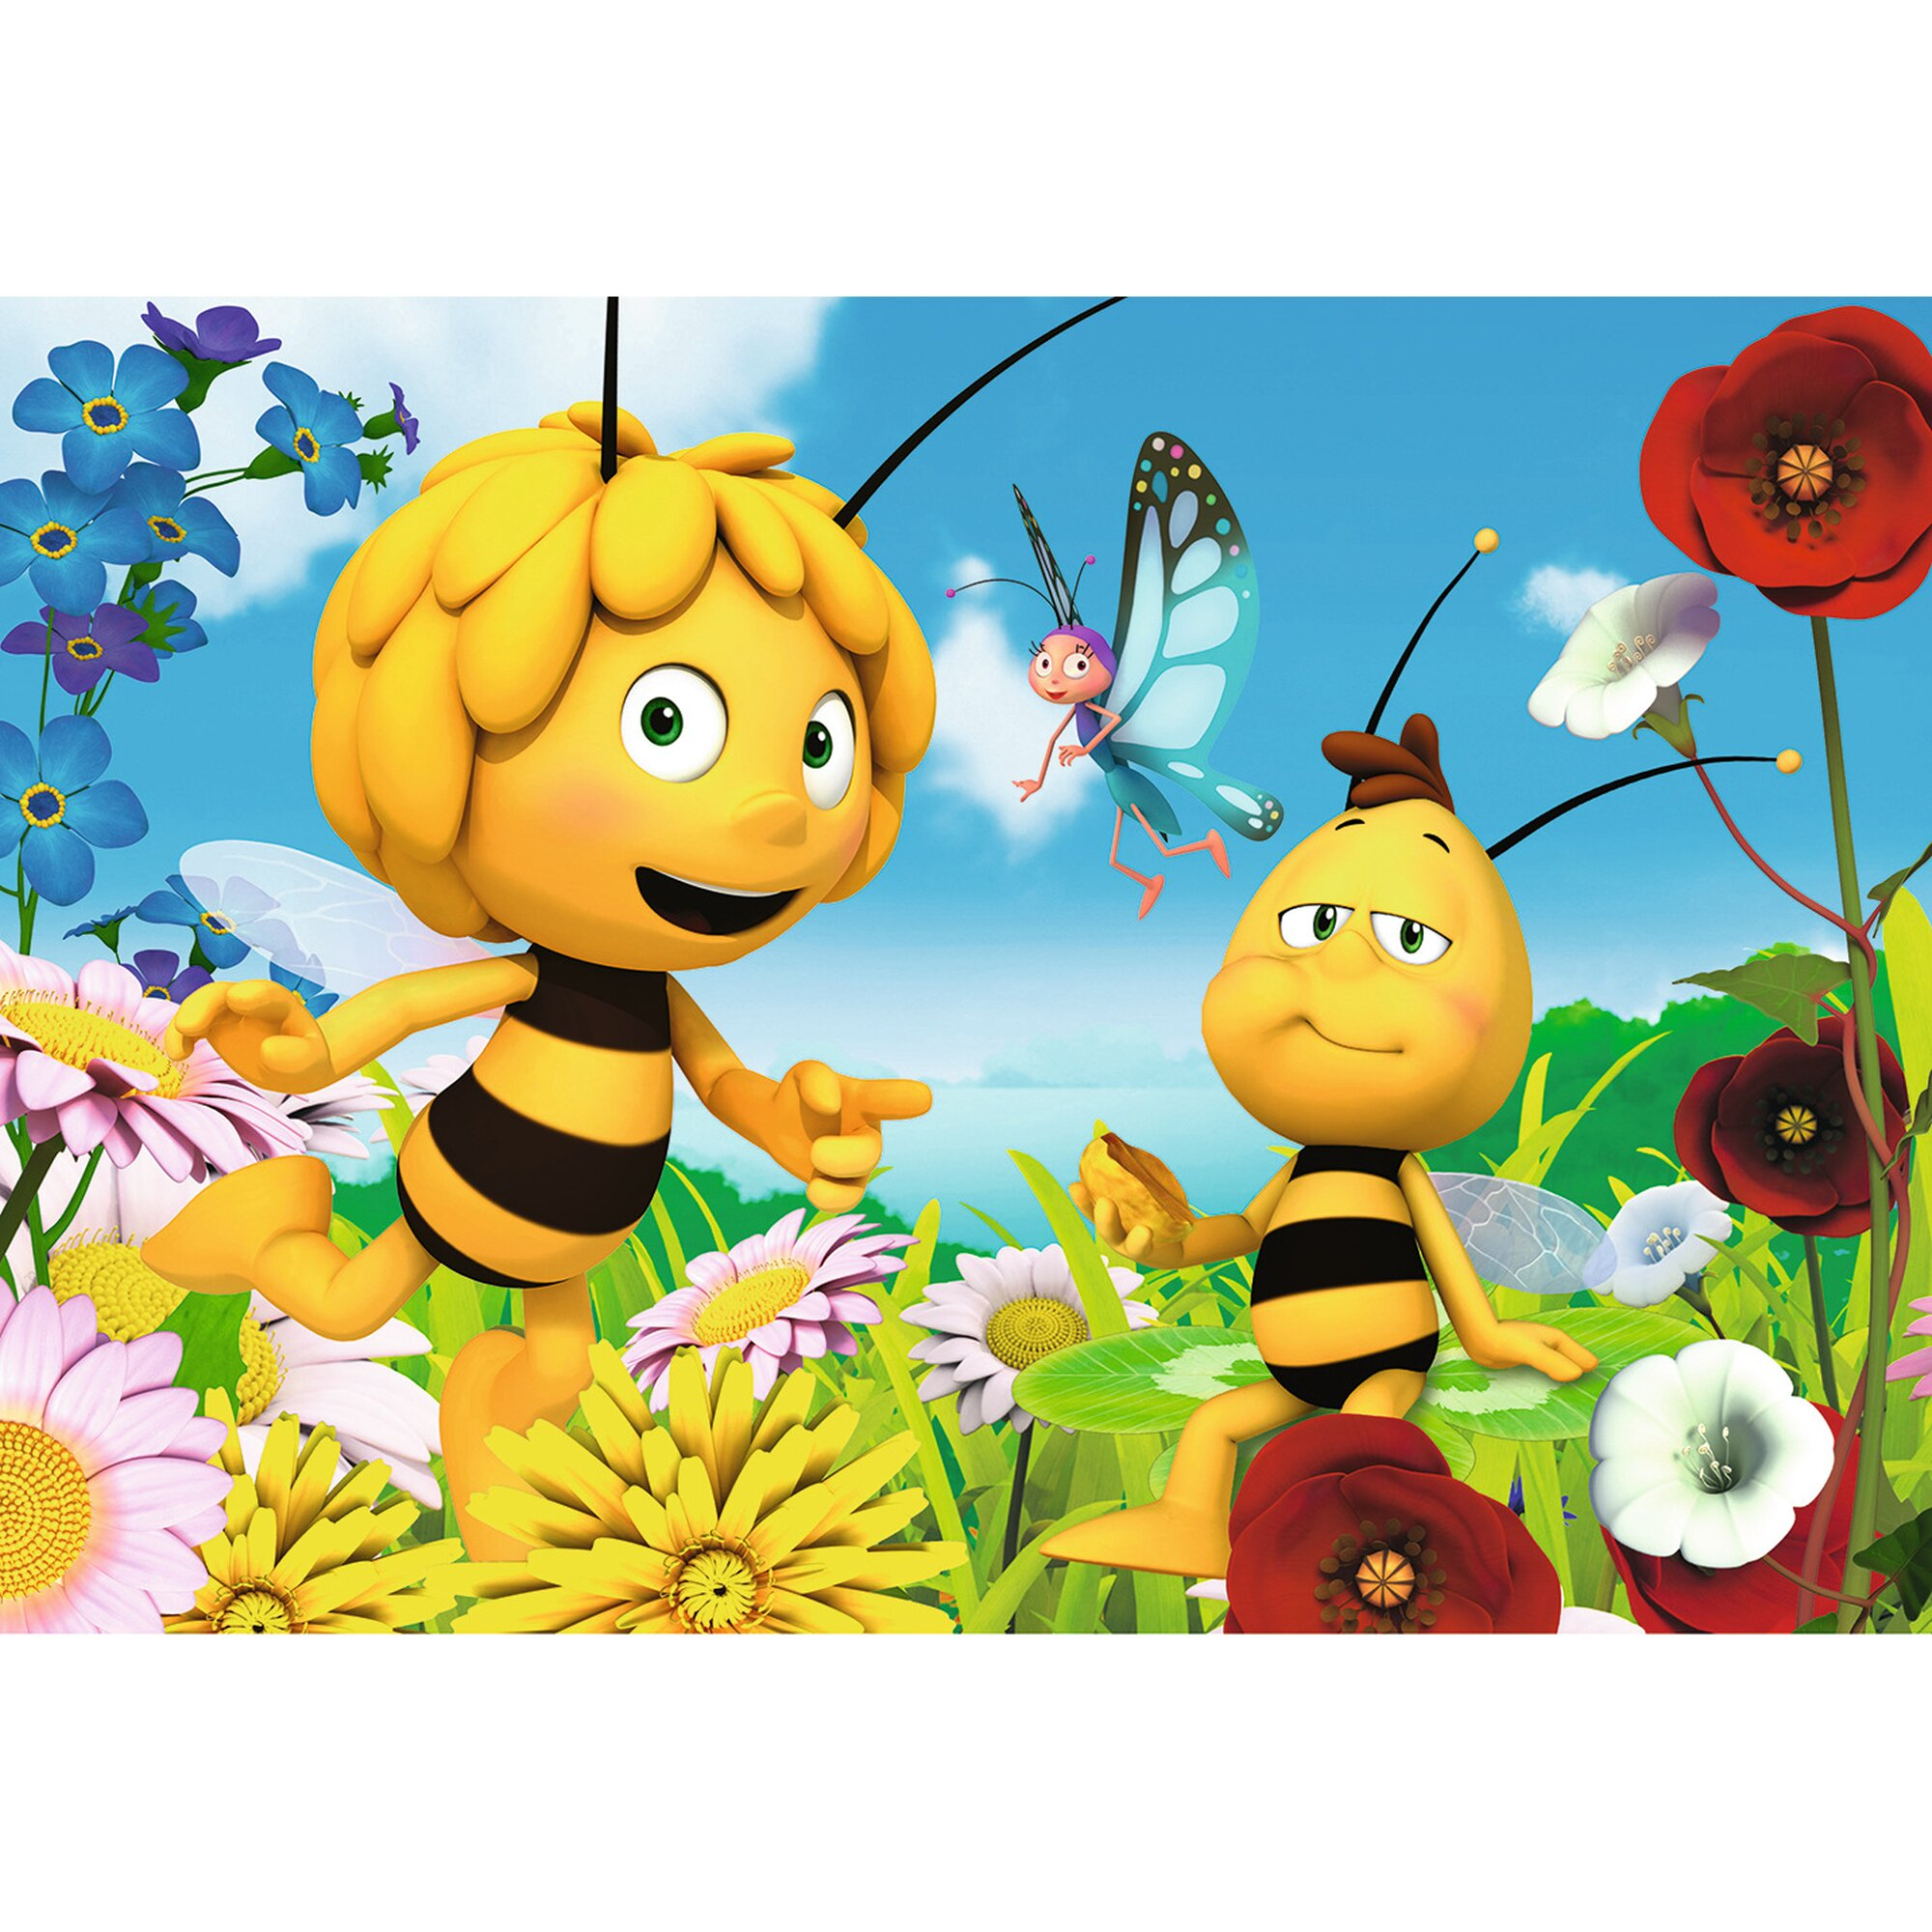 ravensburger-zwei-kinderpuzzles-inkl-mini-postern-24-teile-biene-maja-und-ihre-freunde, 9.99 EUR @ babywalz-de